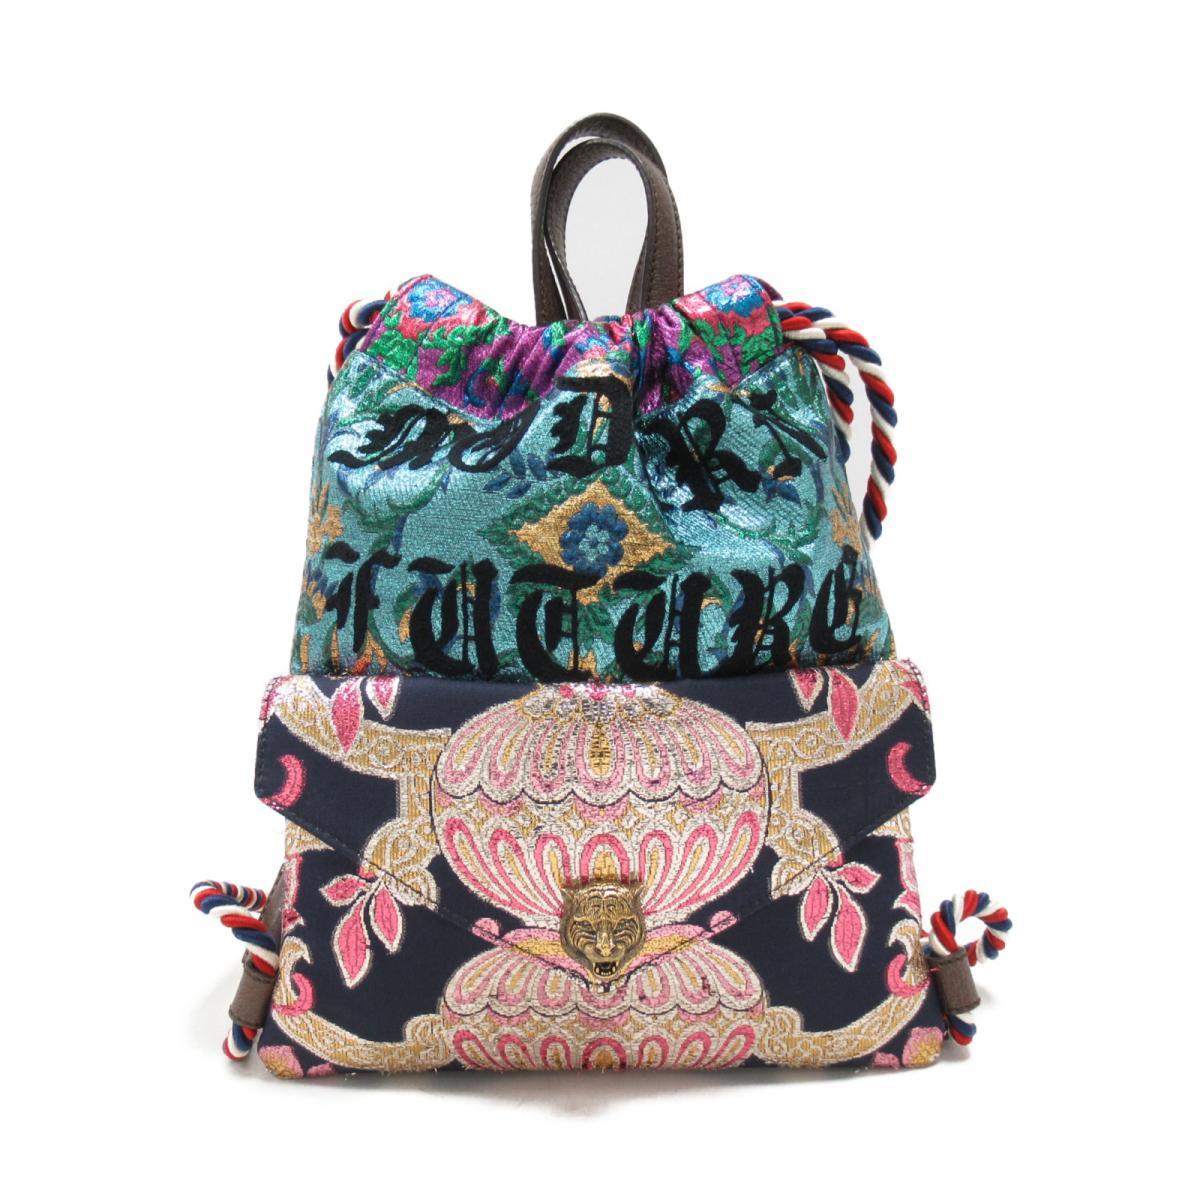 cce30620ca1188 Gucci backpack rucksack bag men gap Dis jacquard fabric x coating canvas  multicolored (470443) ...